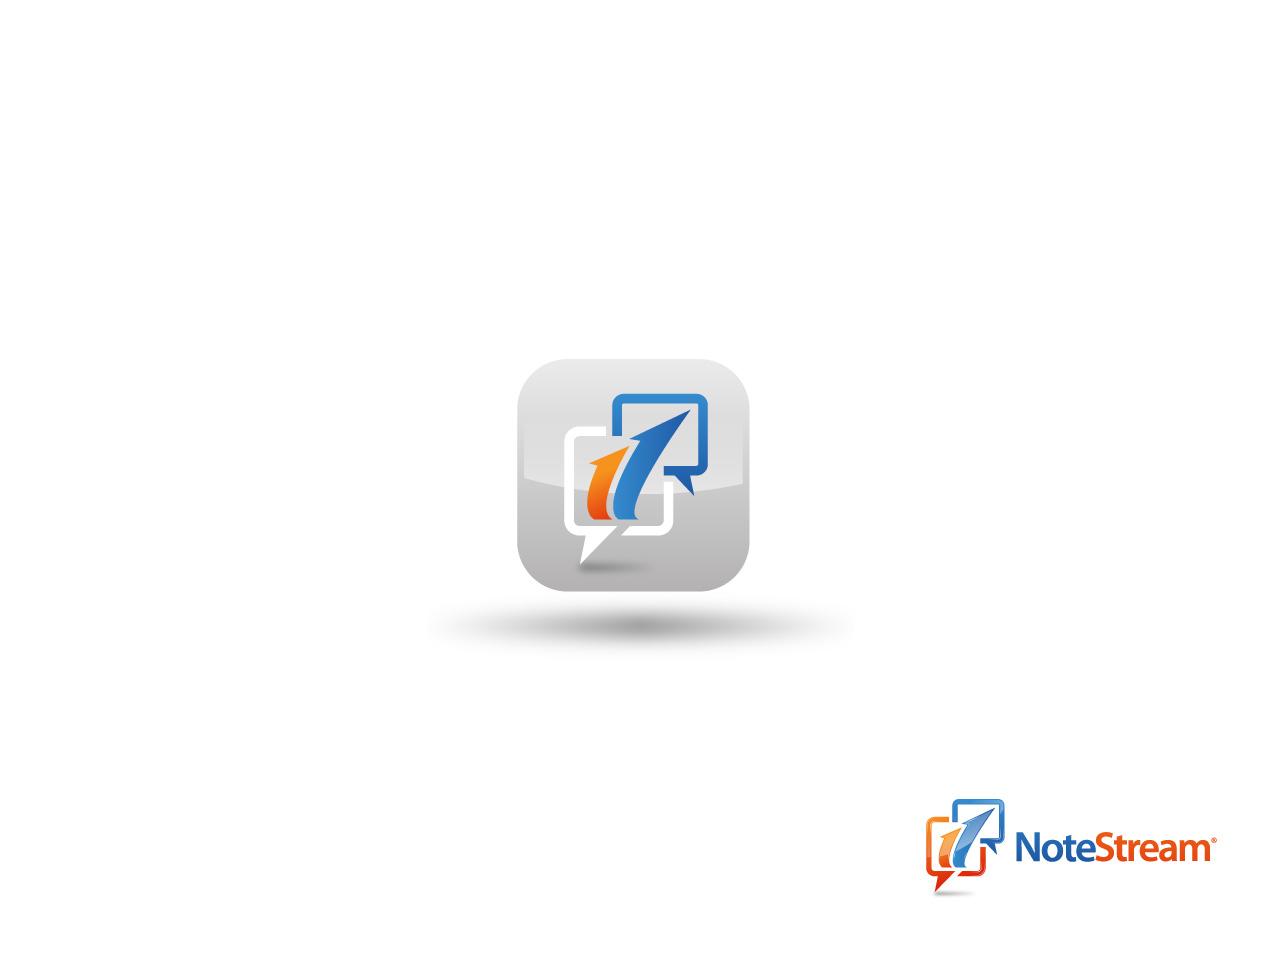 Logo Design by jpbituin - Entry No. 135 in the Logo Design Contest Imaginative Logo Design for NoteStream.